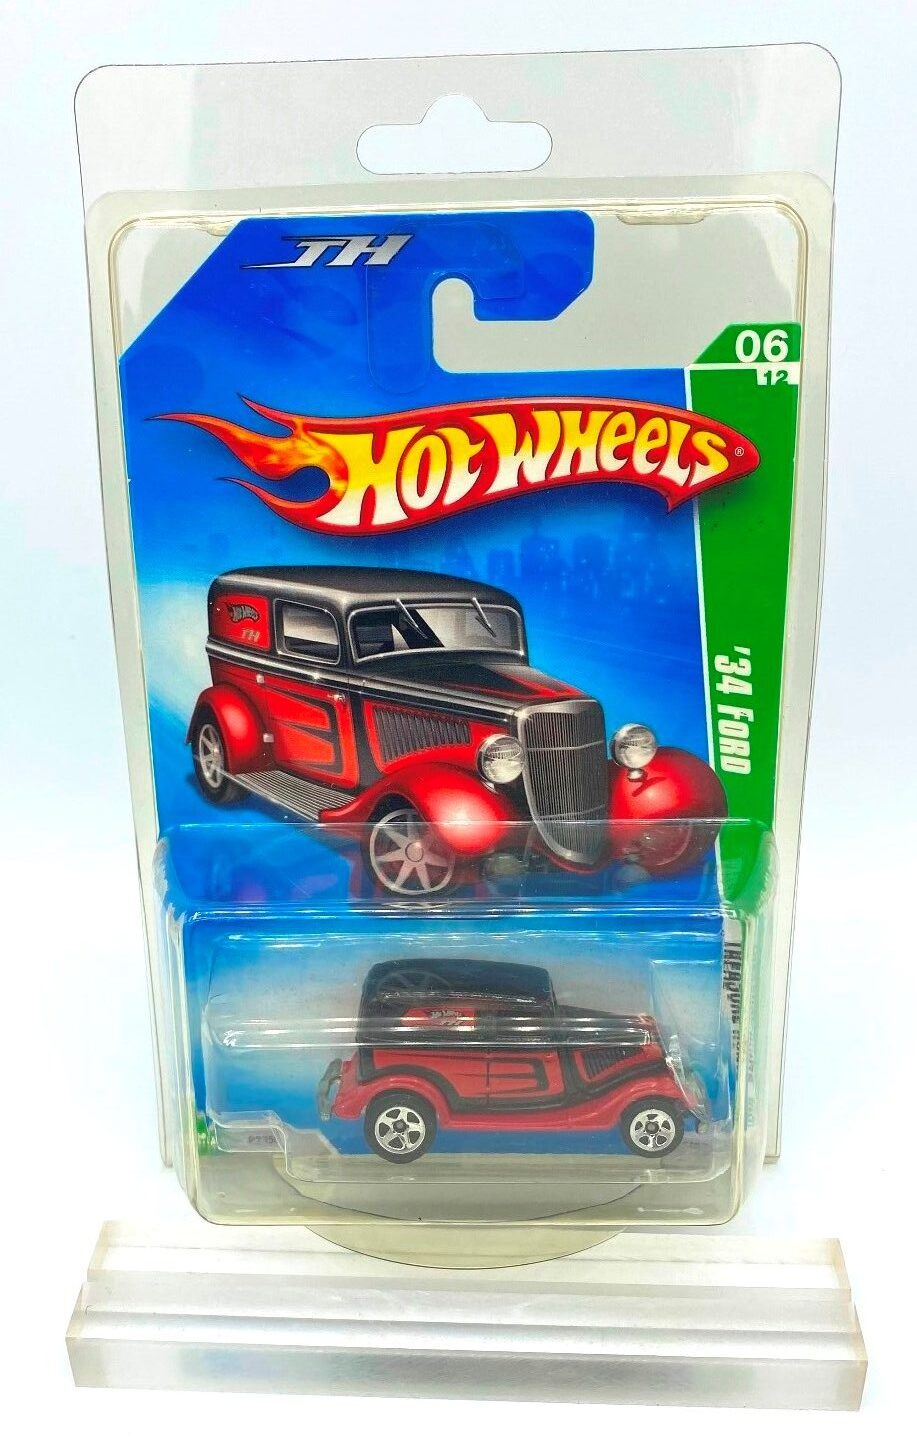 2009 Hot Wheels Treasure Hunts '34 Ford Limited Edition Short Card Rare